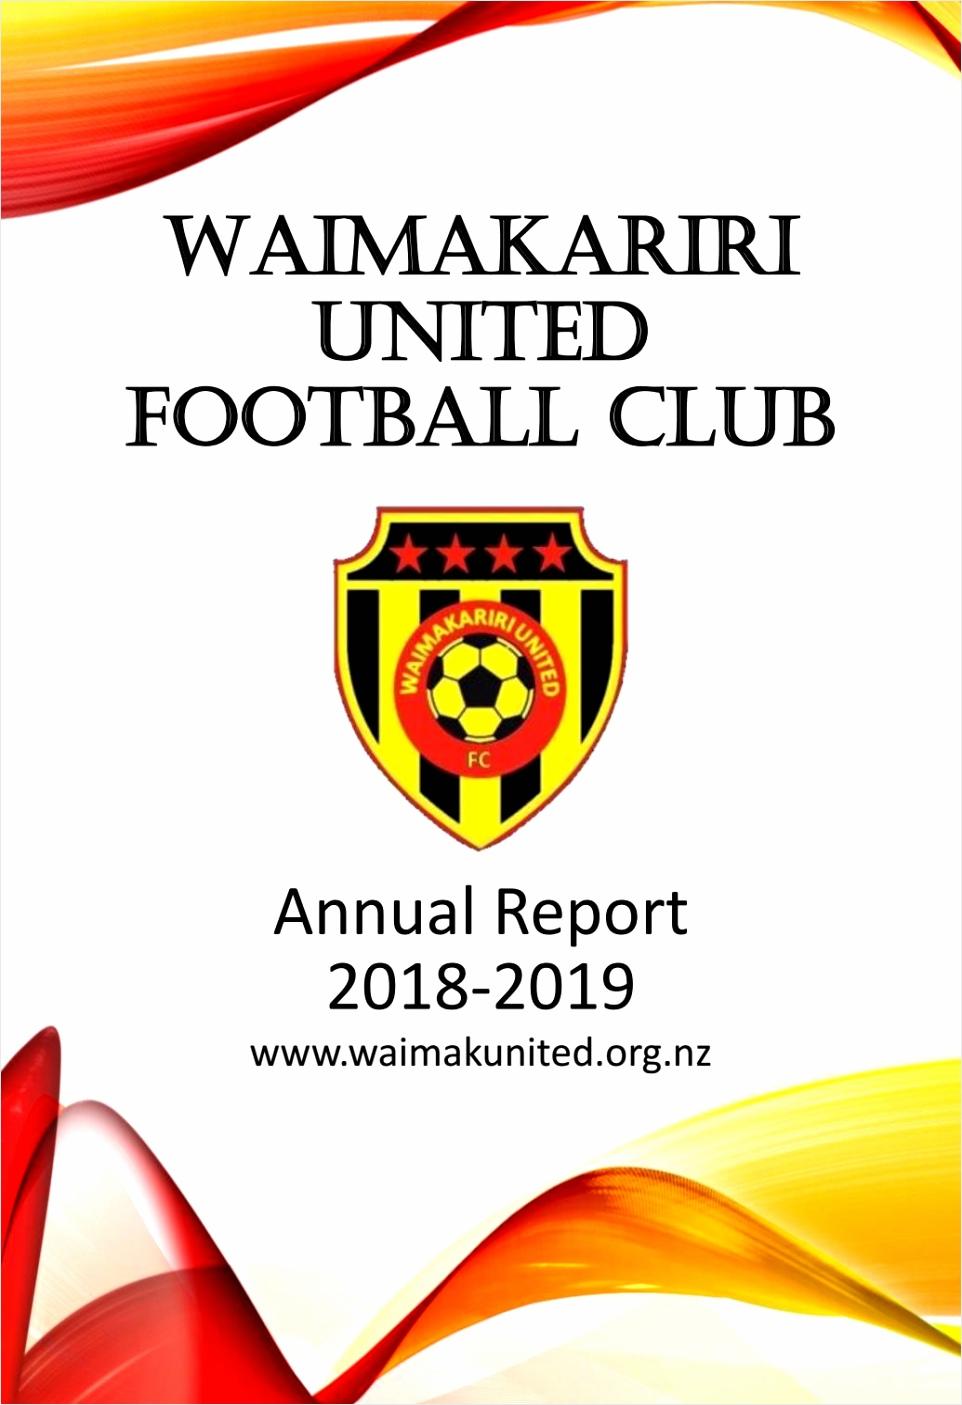 waimakariri united football club annual report 201 tjtoo